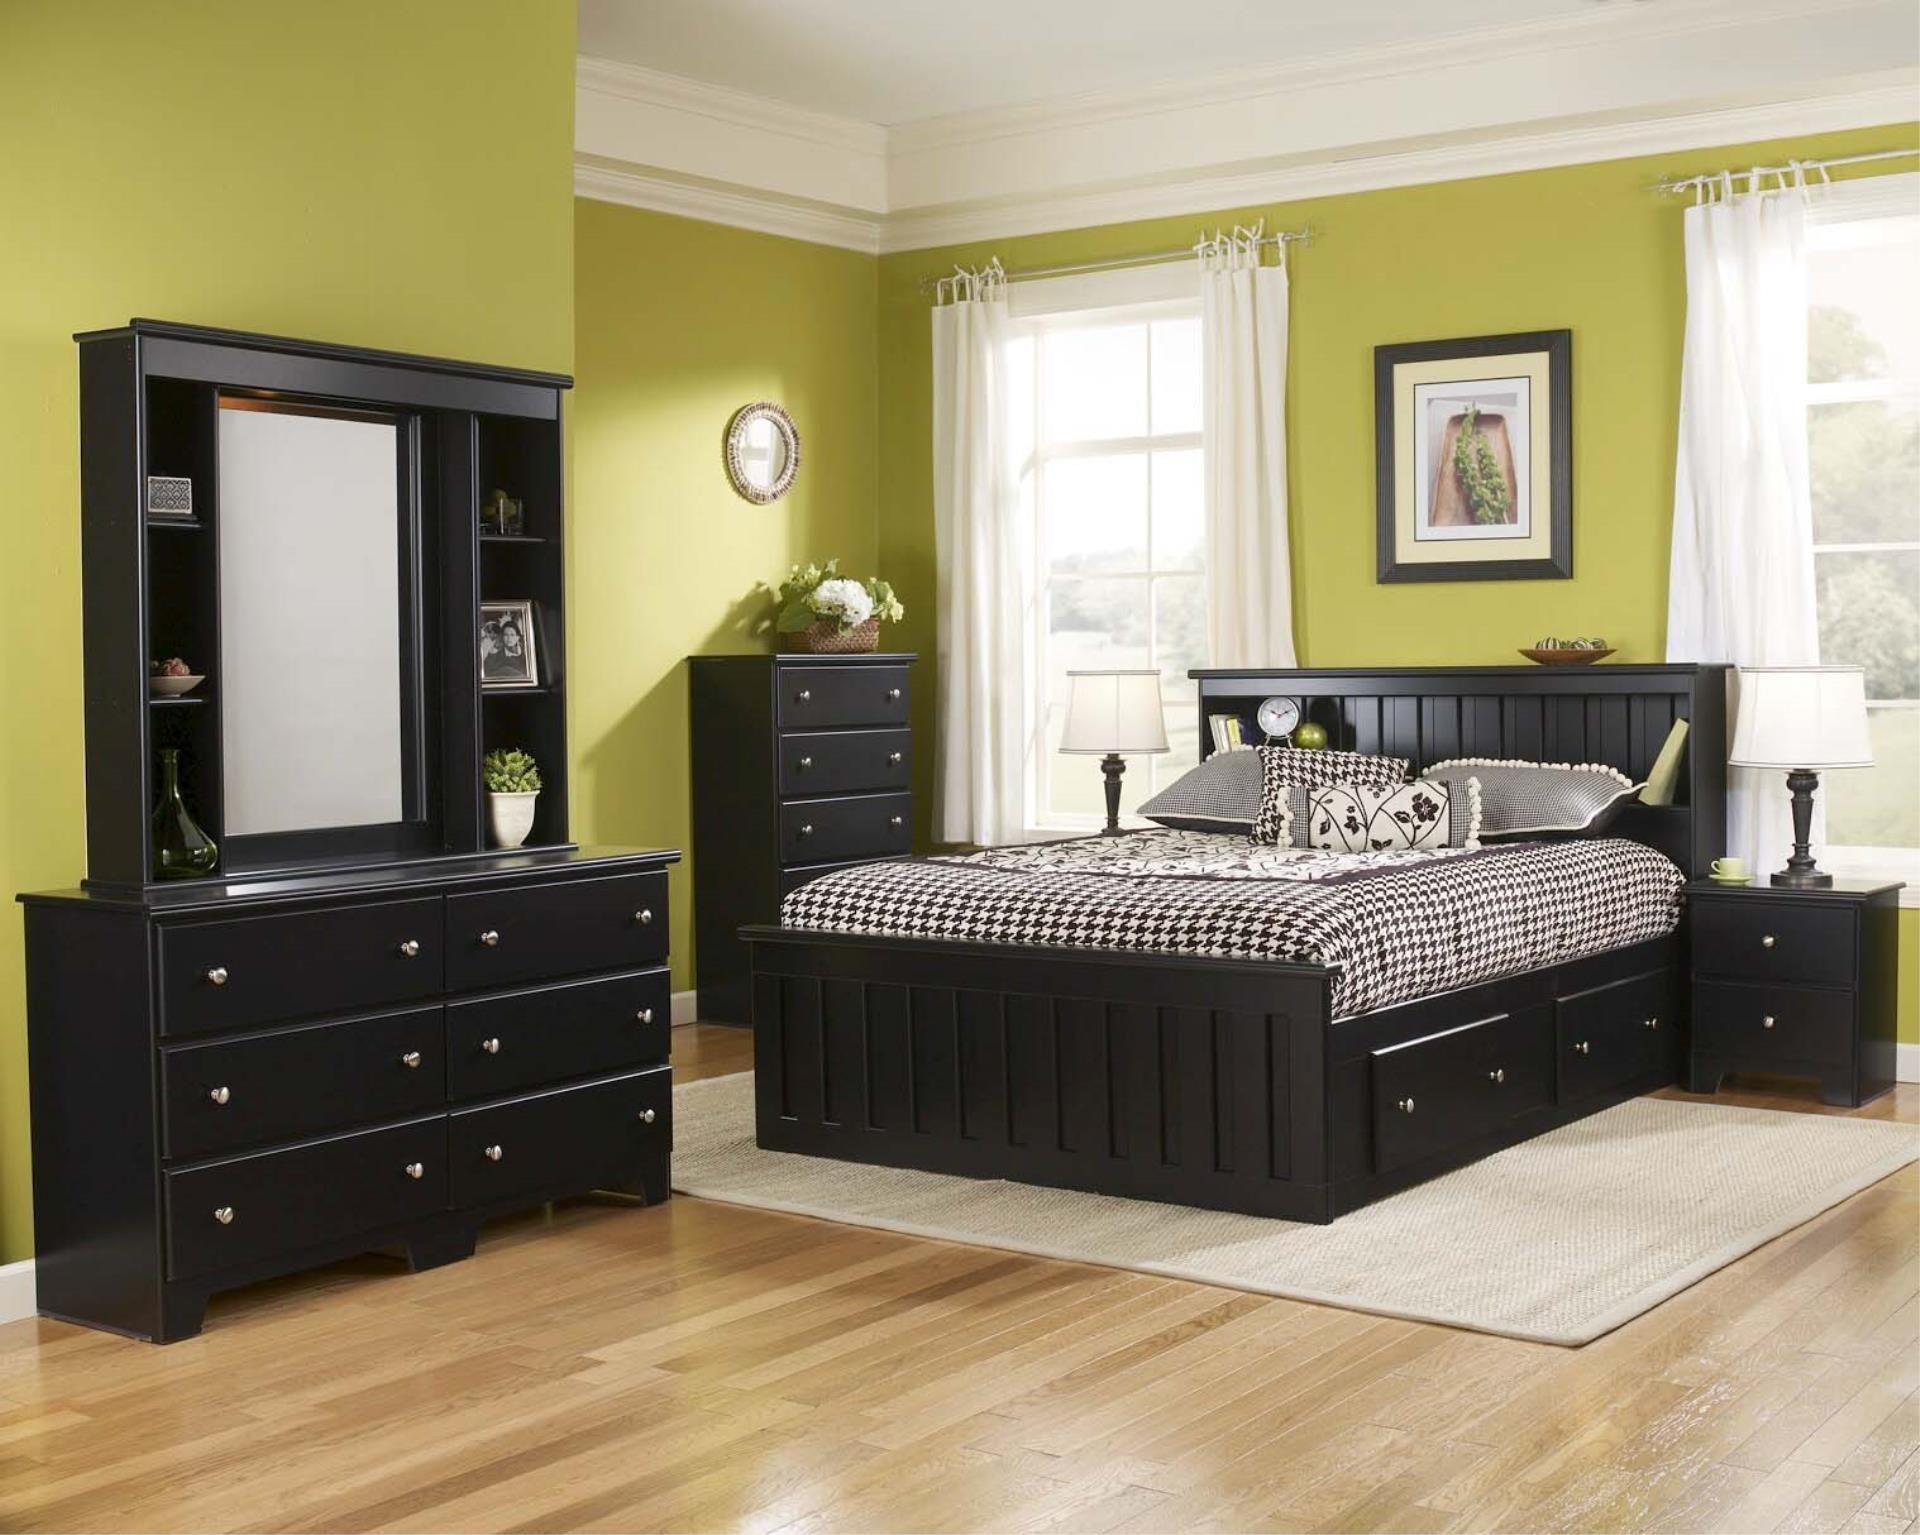 Residential Lang Classic bedroom furniture, Black